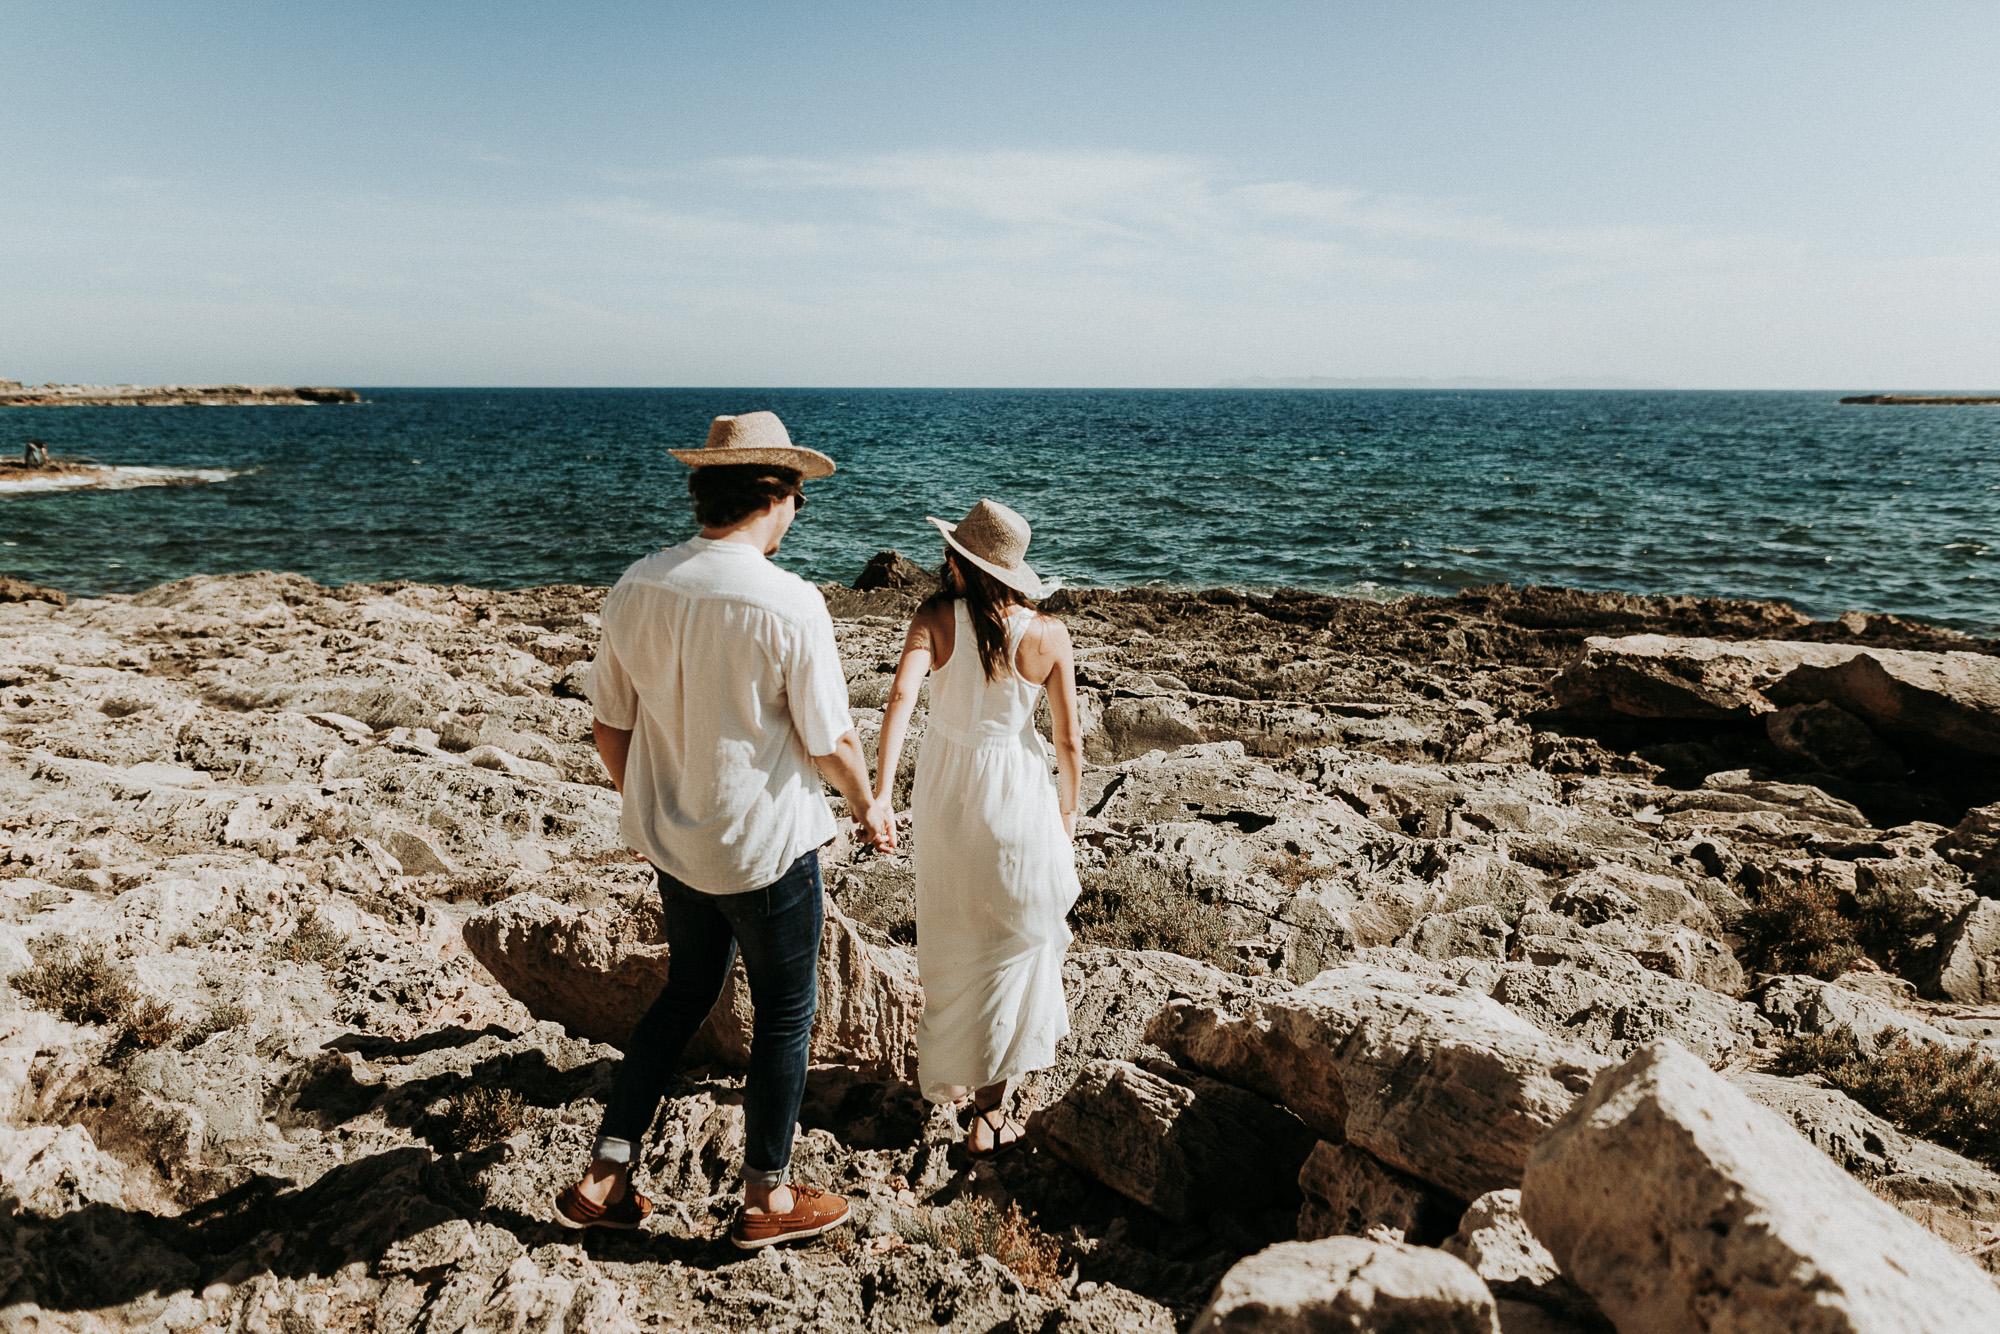 DanielaMarquardtPhotography_wedding_elopement_mallorca_spain_stjordi_sessalines_marinaandxavi341